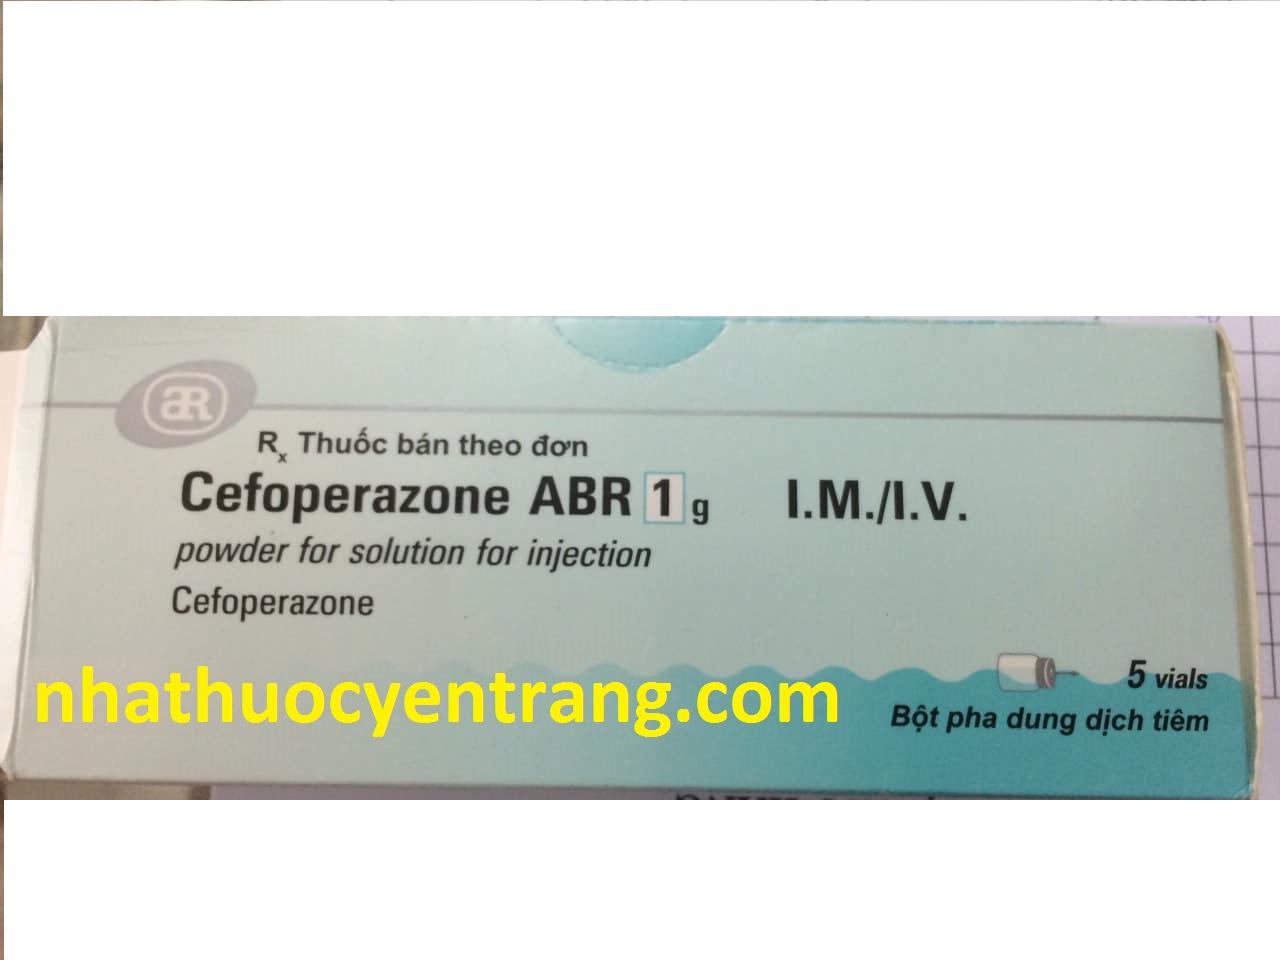 Cefoperazone ABR 1g